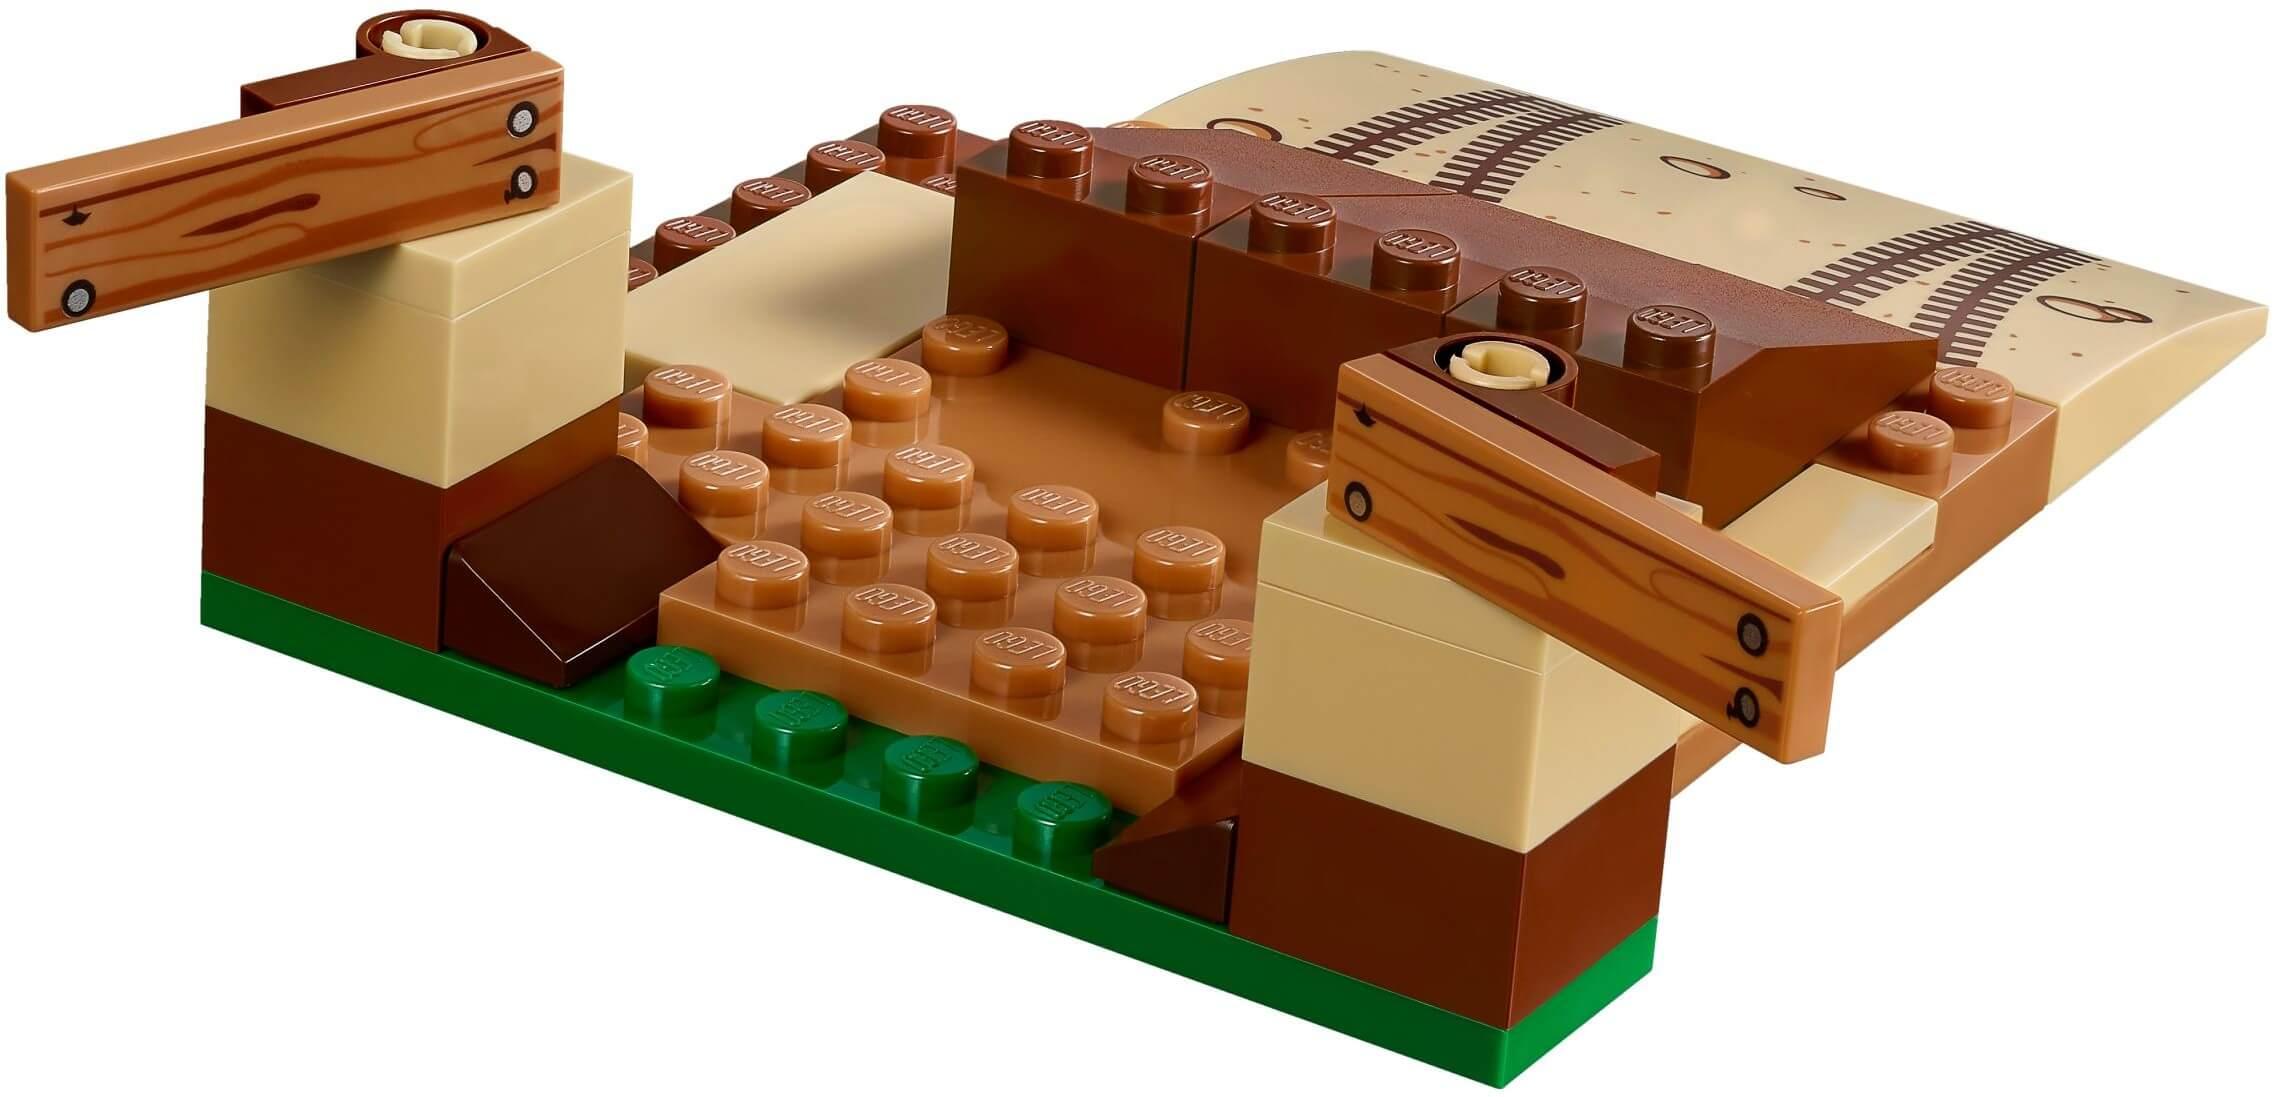 Mua đồ chơi LEGO 10742 - LEGO Juniors 10742 - McQueen luyện tập Tốc Độ (LEGO Juniors Cars 3: Willy's Butte Speed Training)